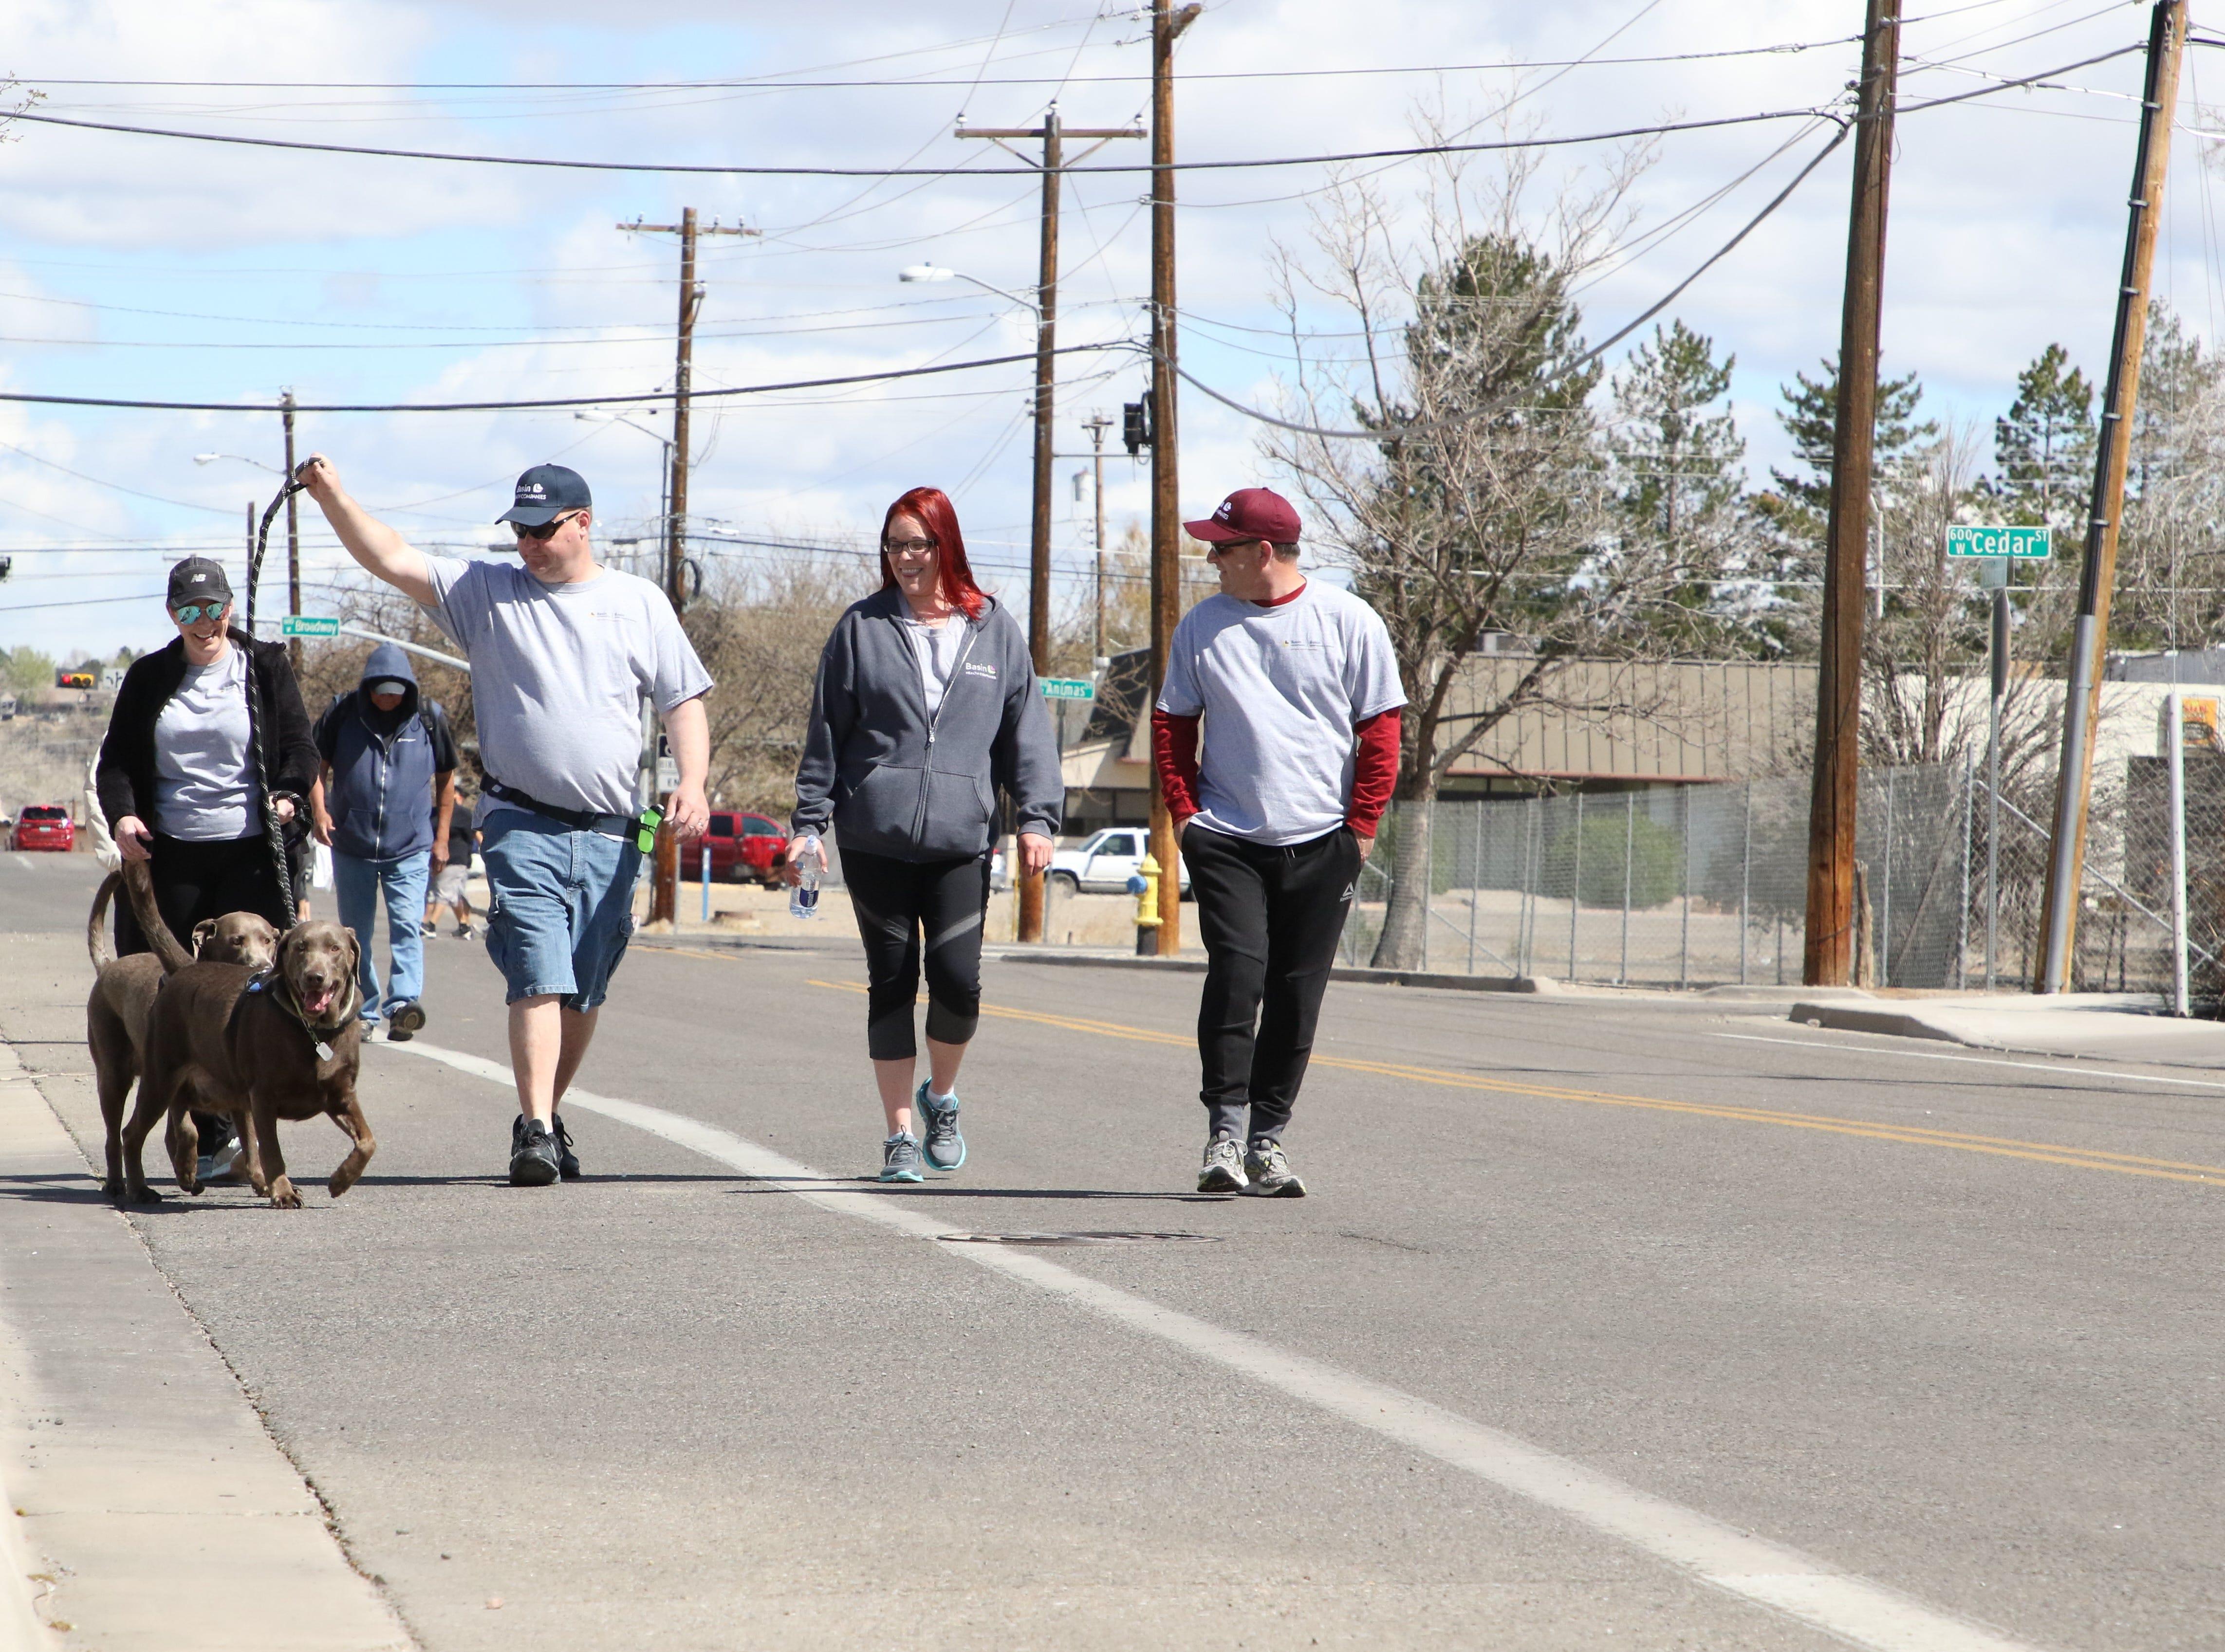 Participants walk near the San Juan Regional Heart Center in Farmington as part of the 11th annual A Fair of the Heart and Goosebump Race on Saturday.